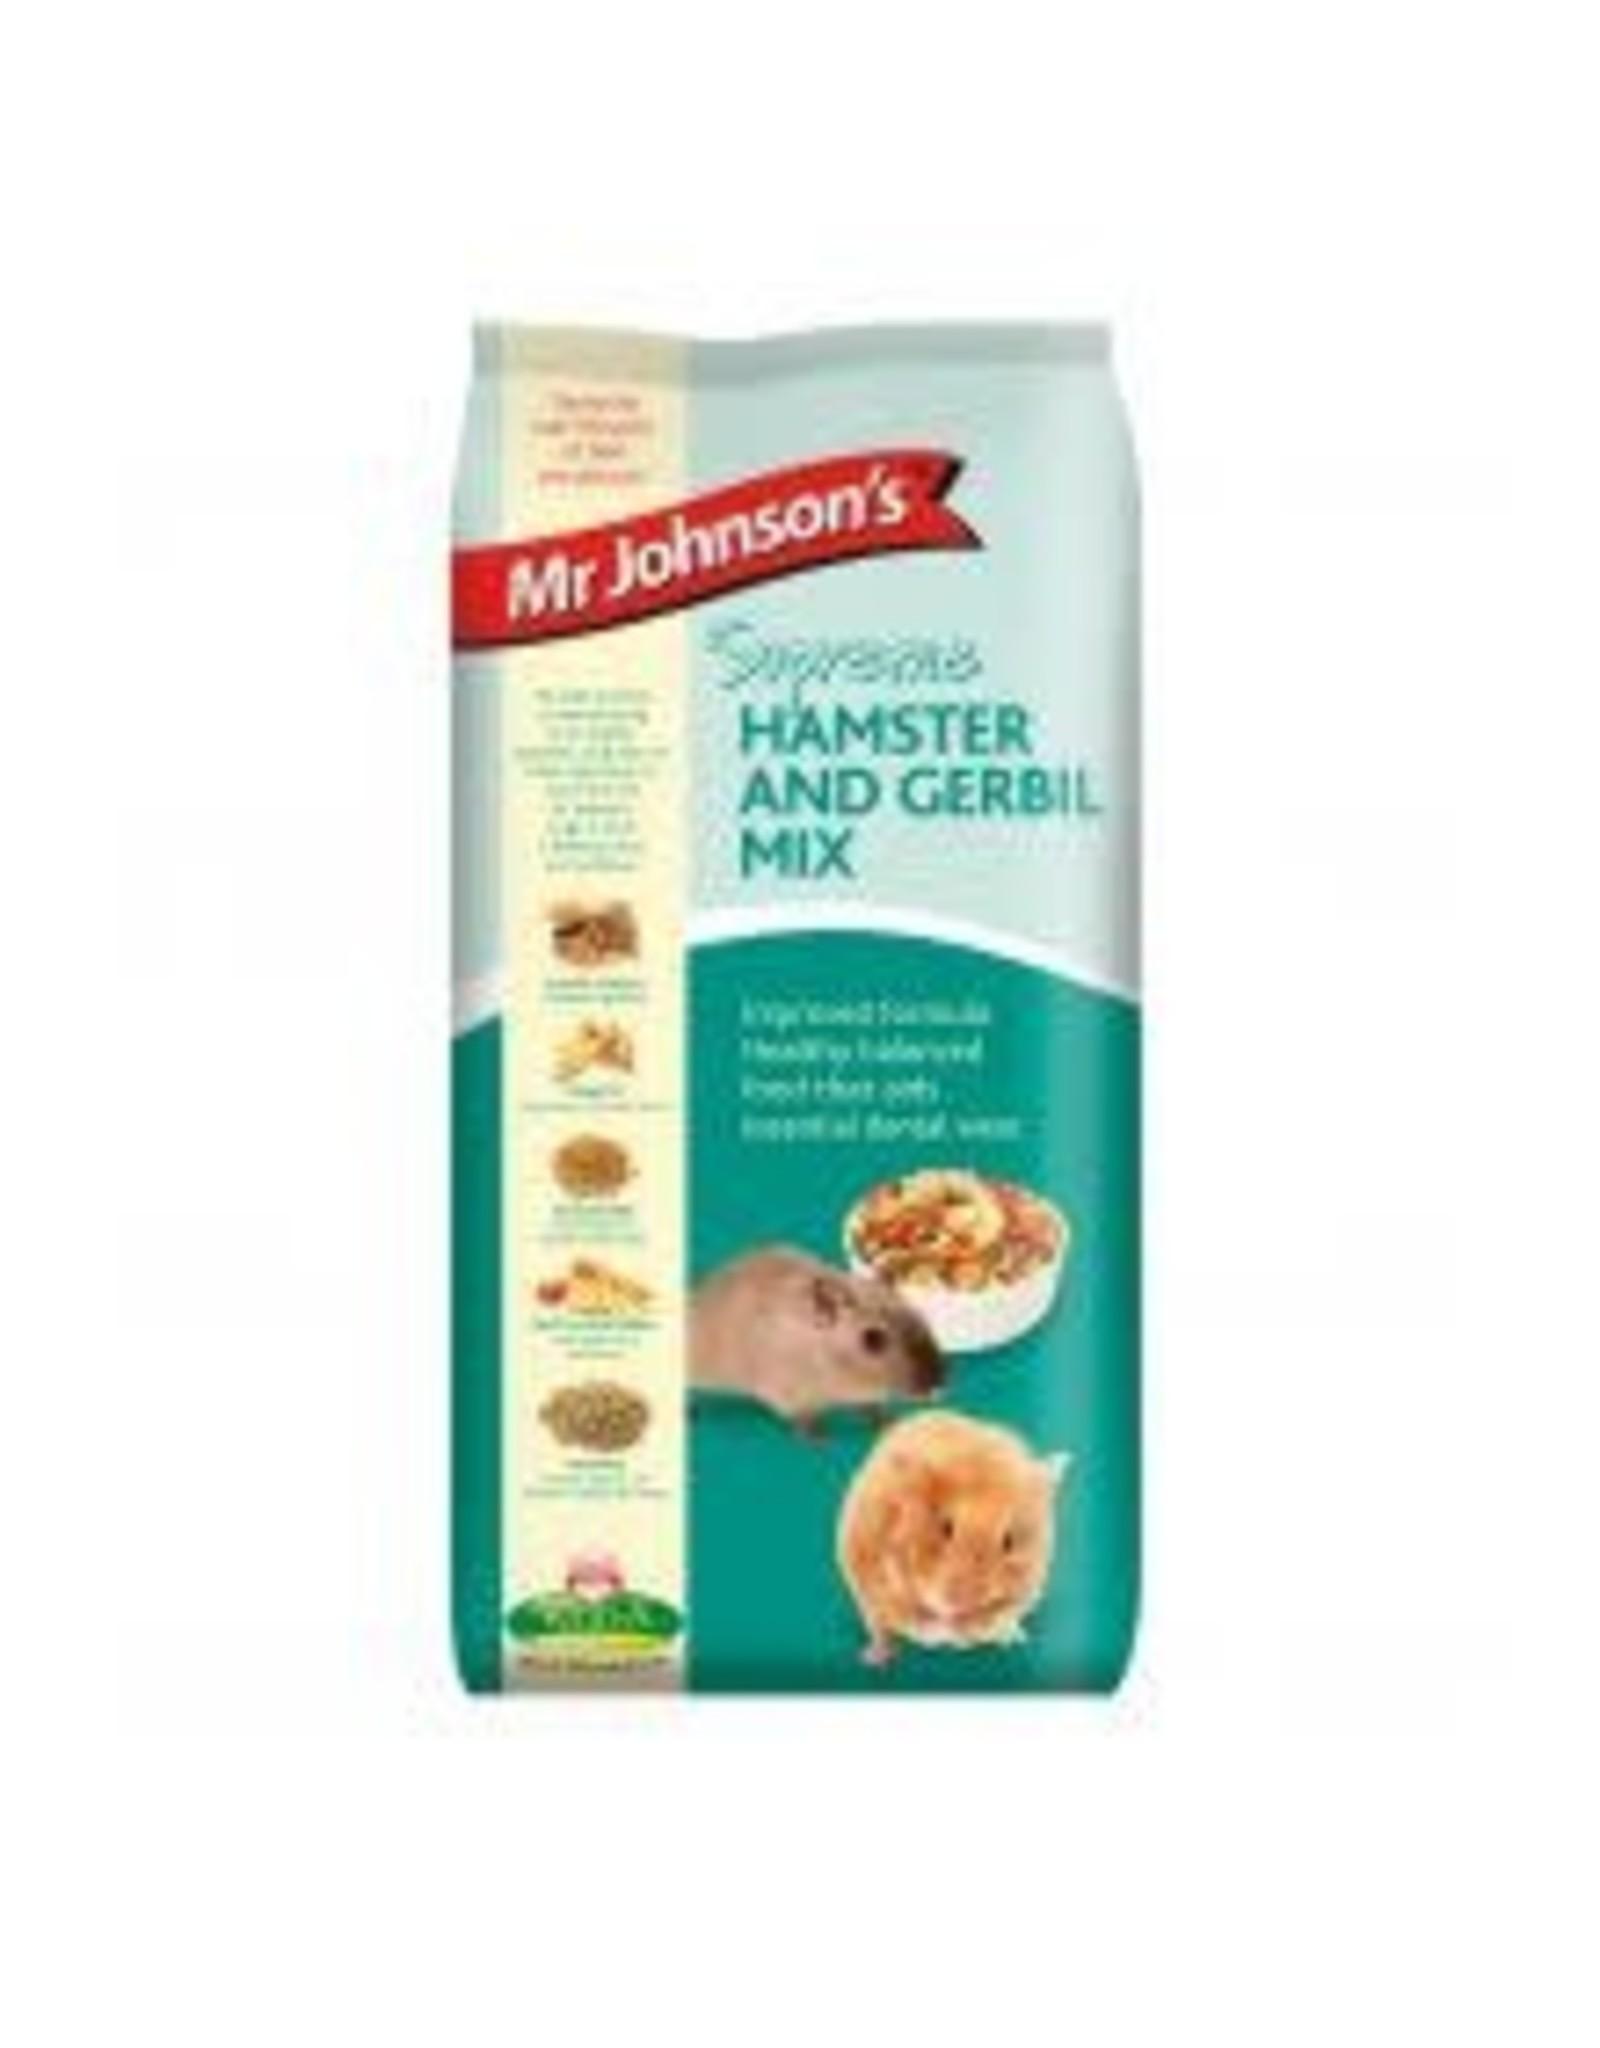 Mr Johnson's Mr Johnsons Supreme Hamster & Gerbil Mix 900g